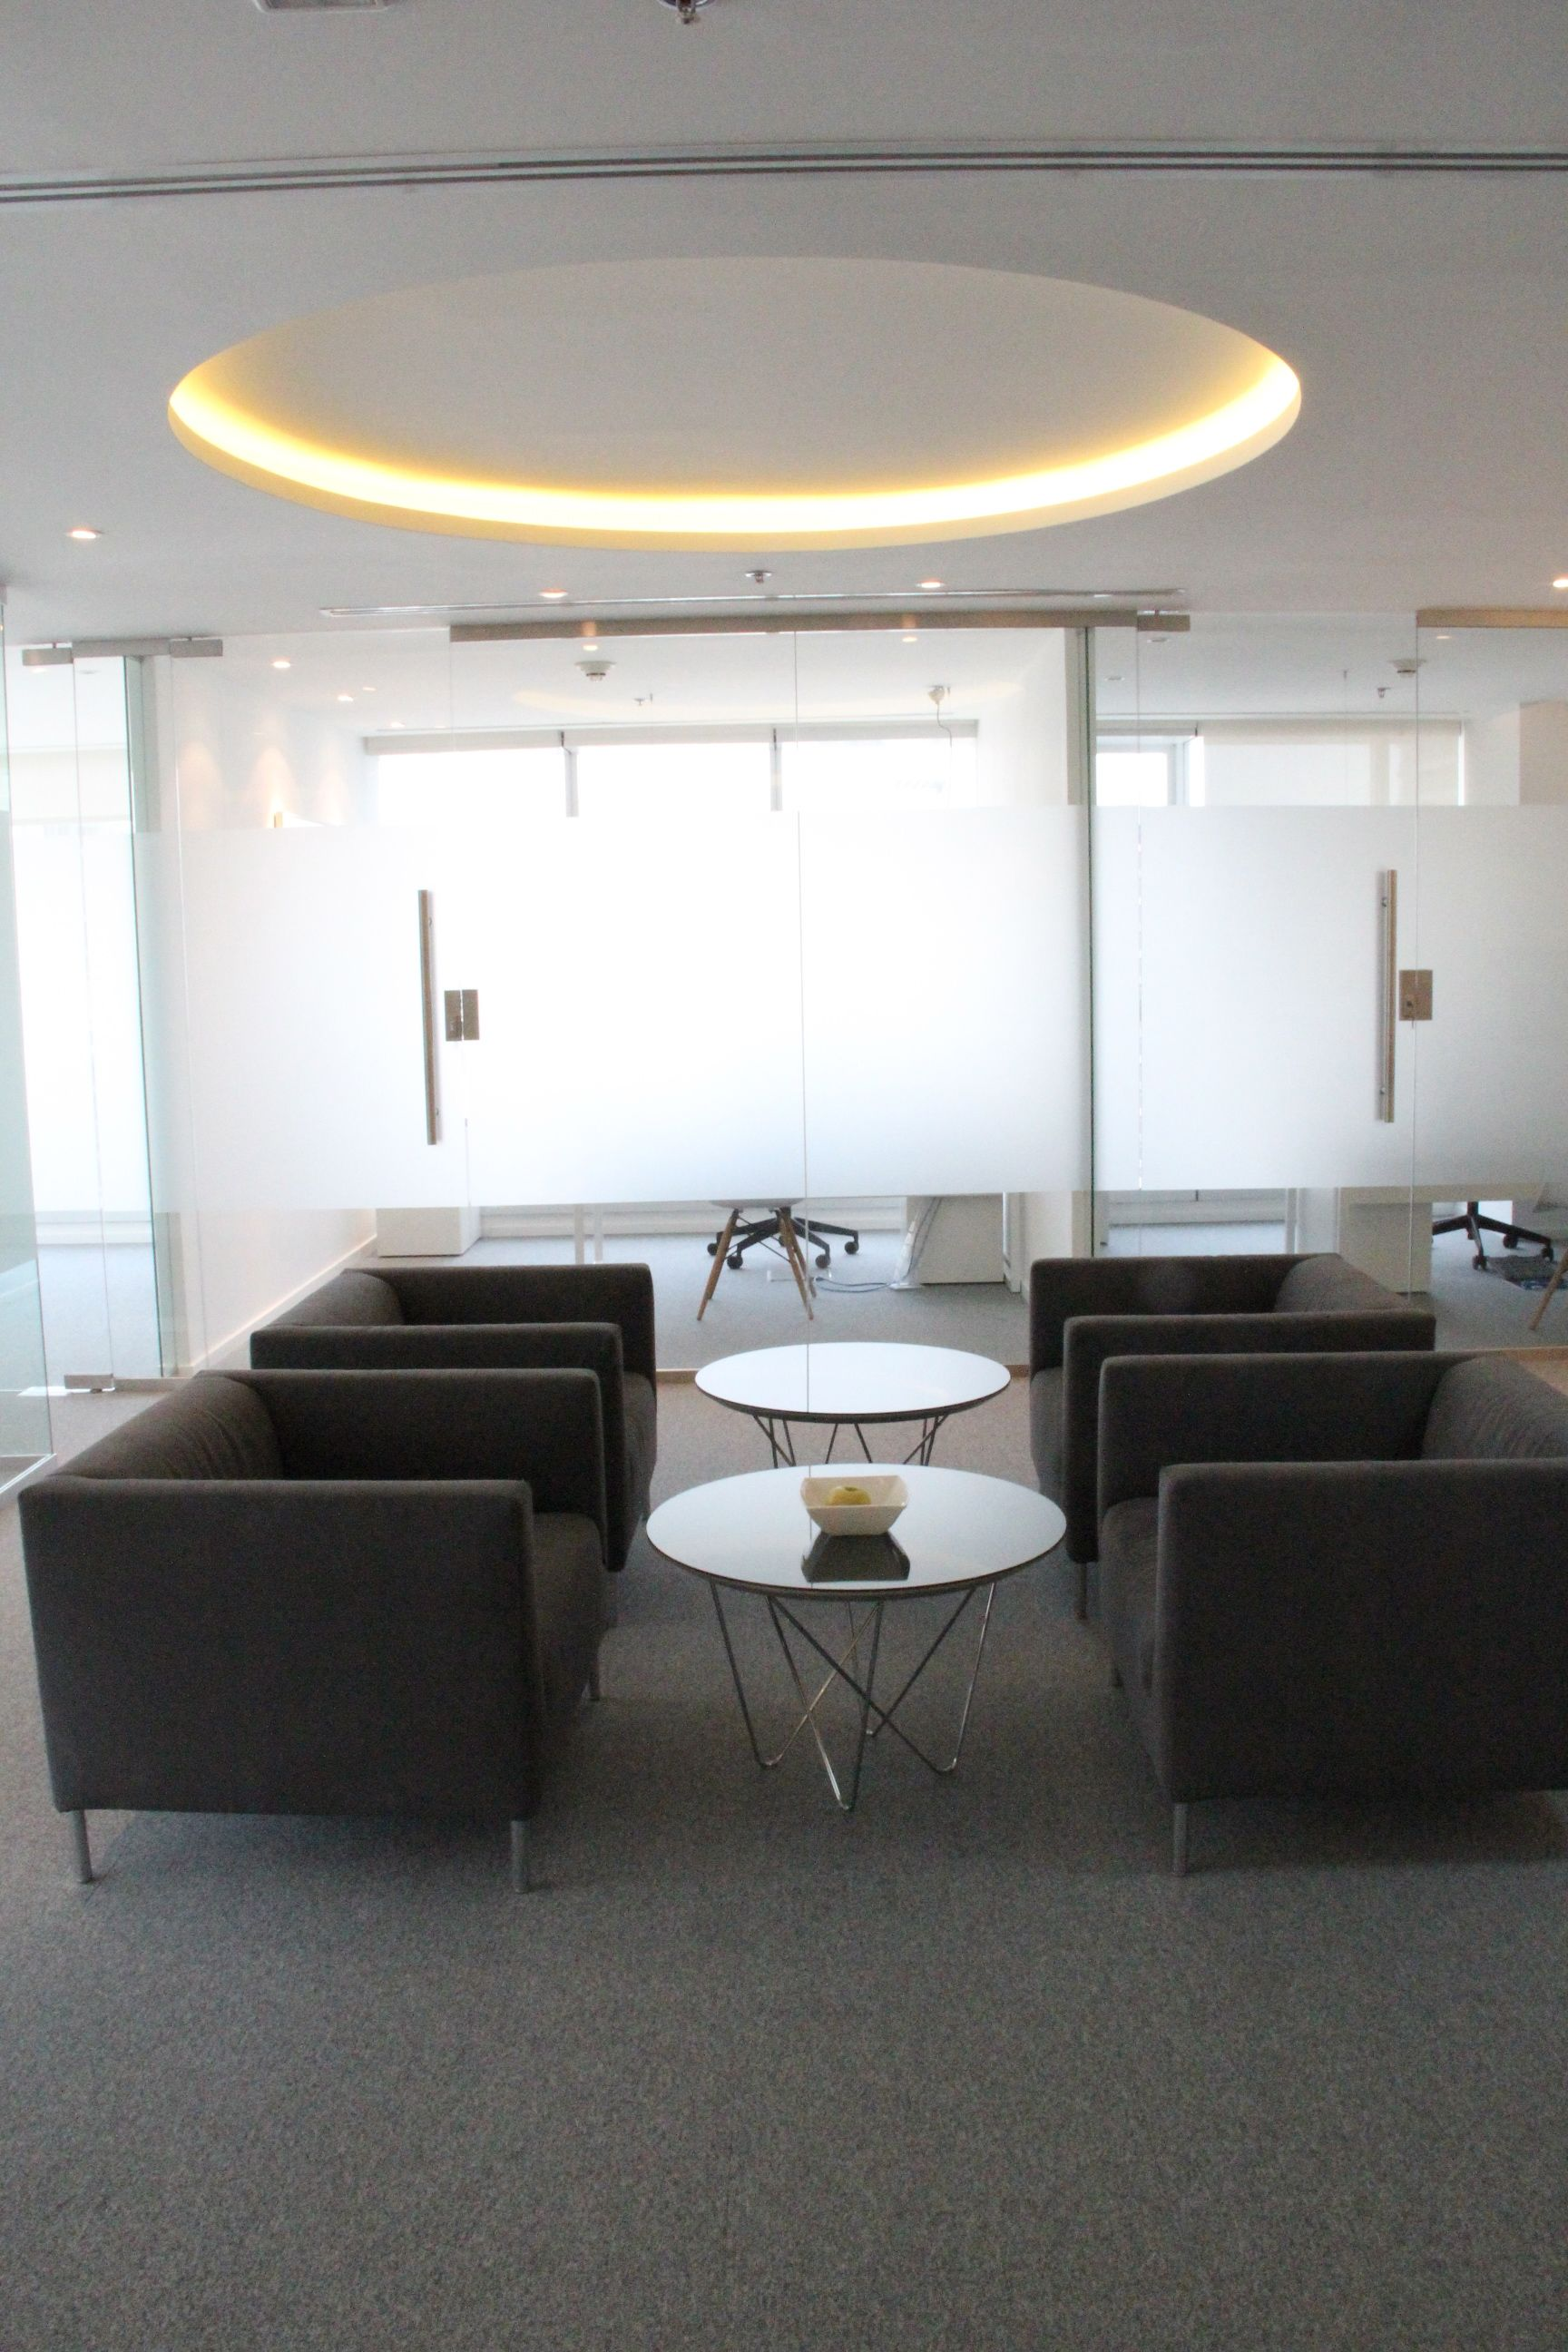 Swiss Bureau Interior Design Company Dubai Uae: Lounge Design By Swiss Bureau Interior